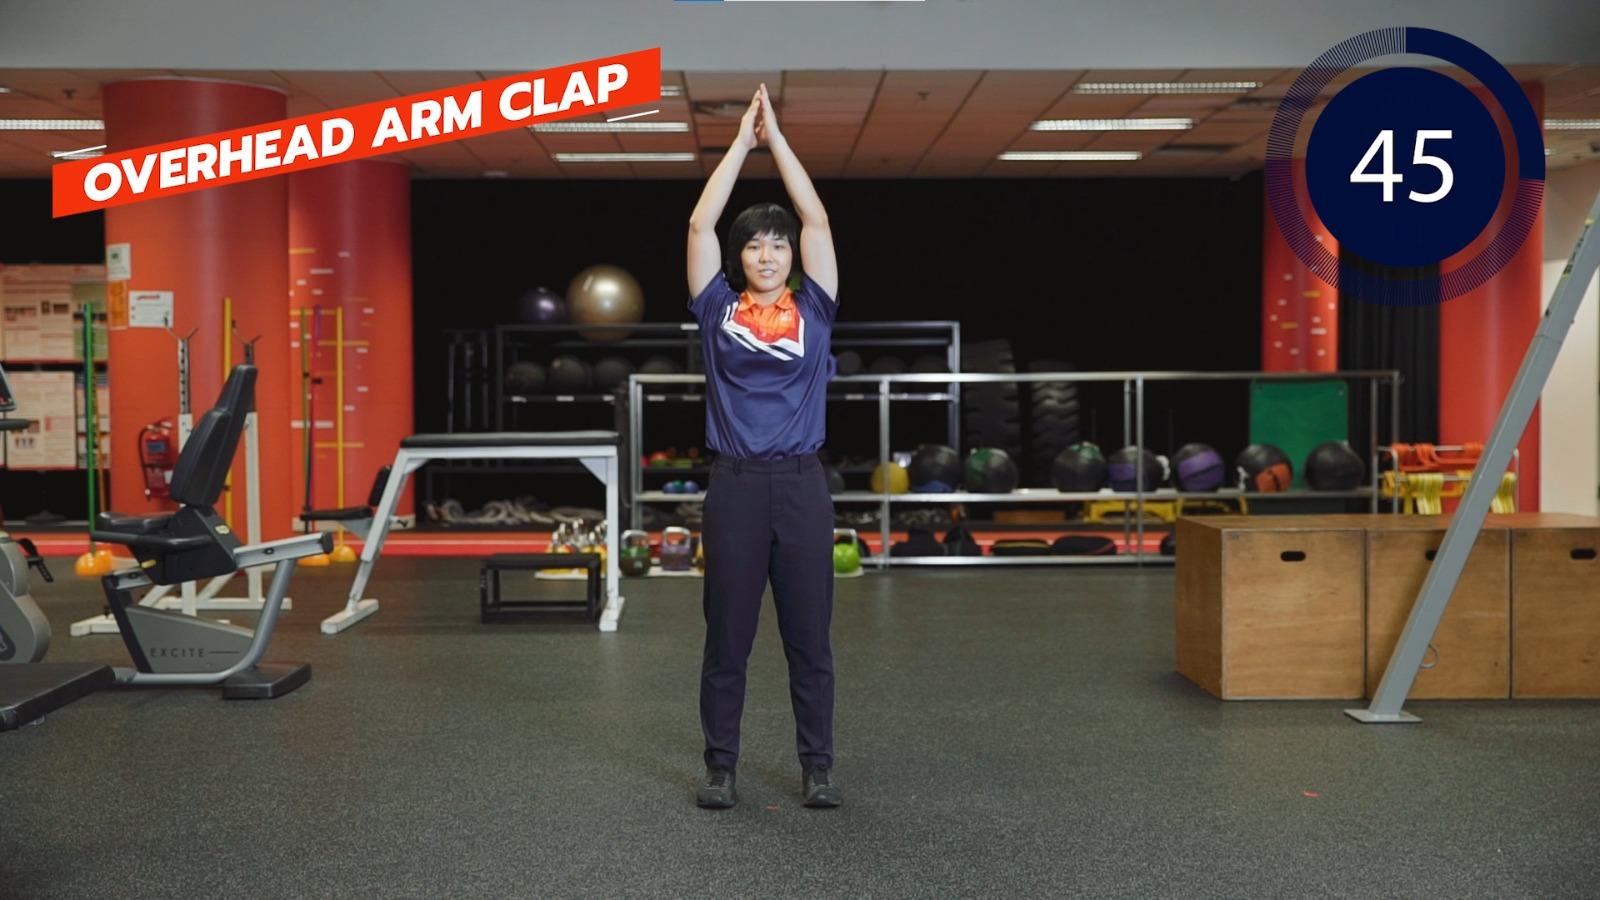 overhead arm clap